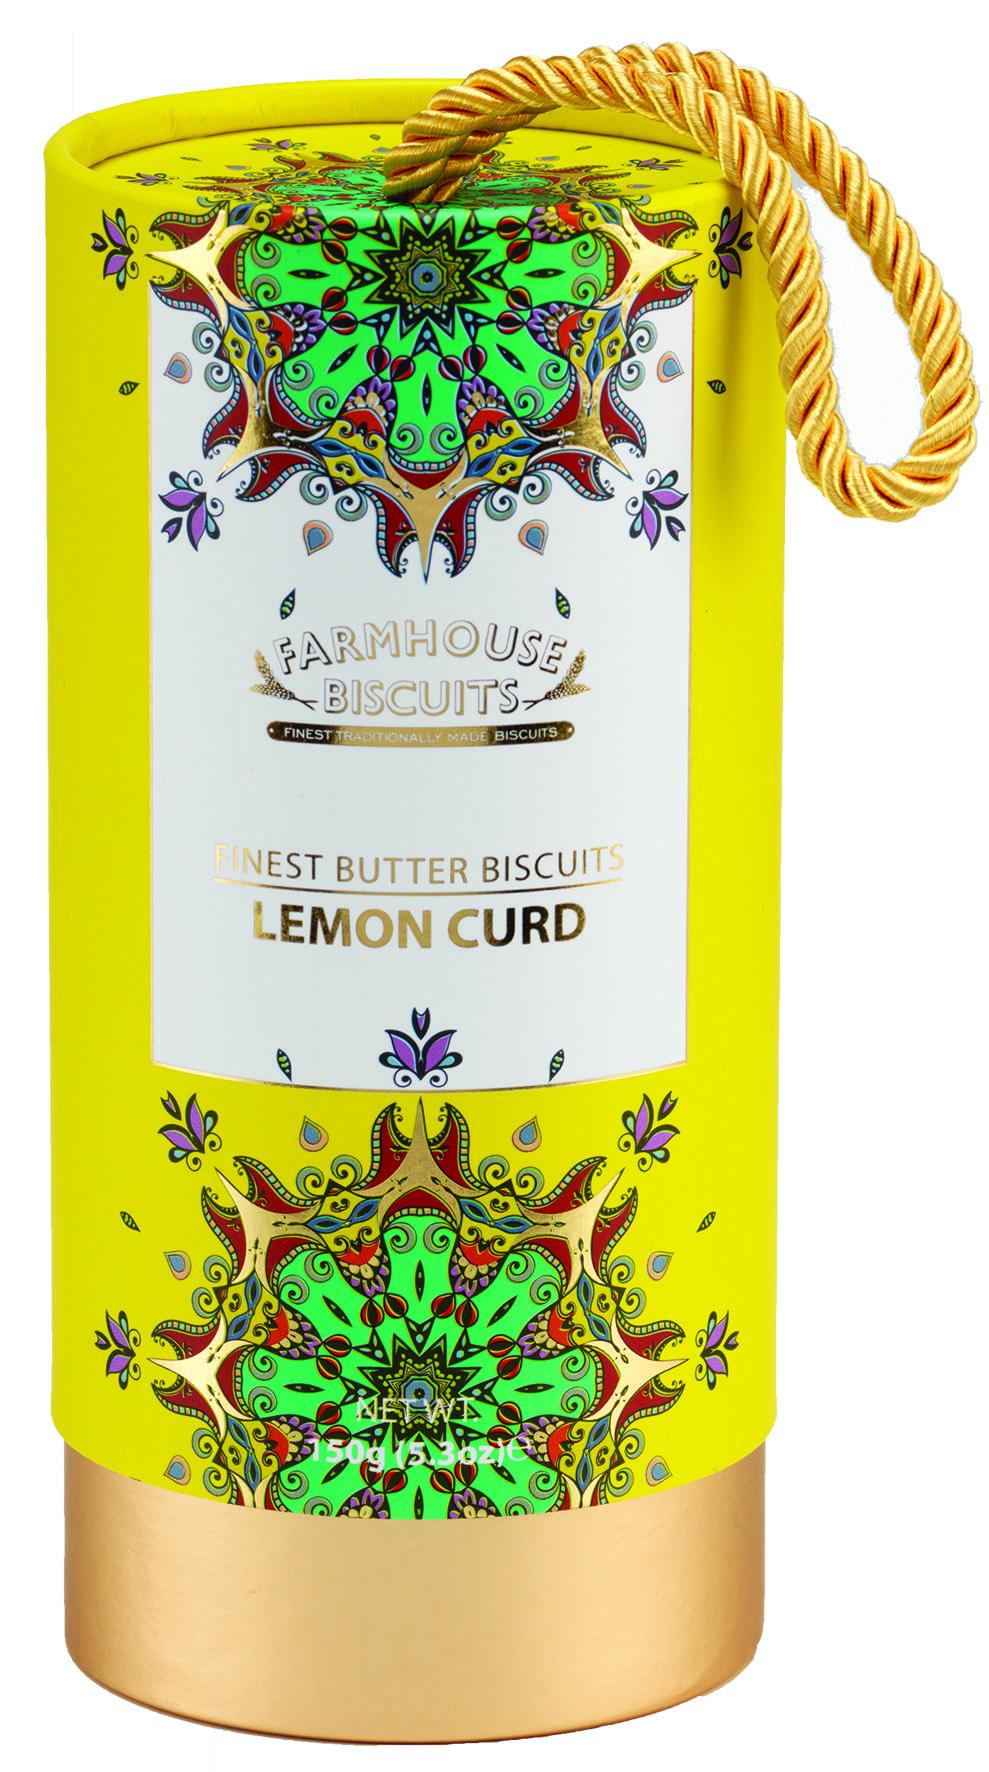 Tubo kensington - Bolachas com lemon curd 150g